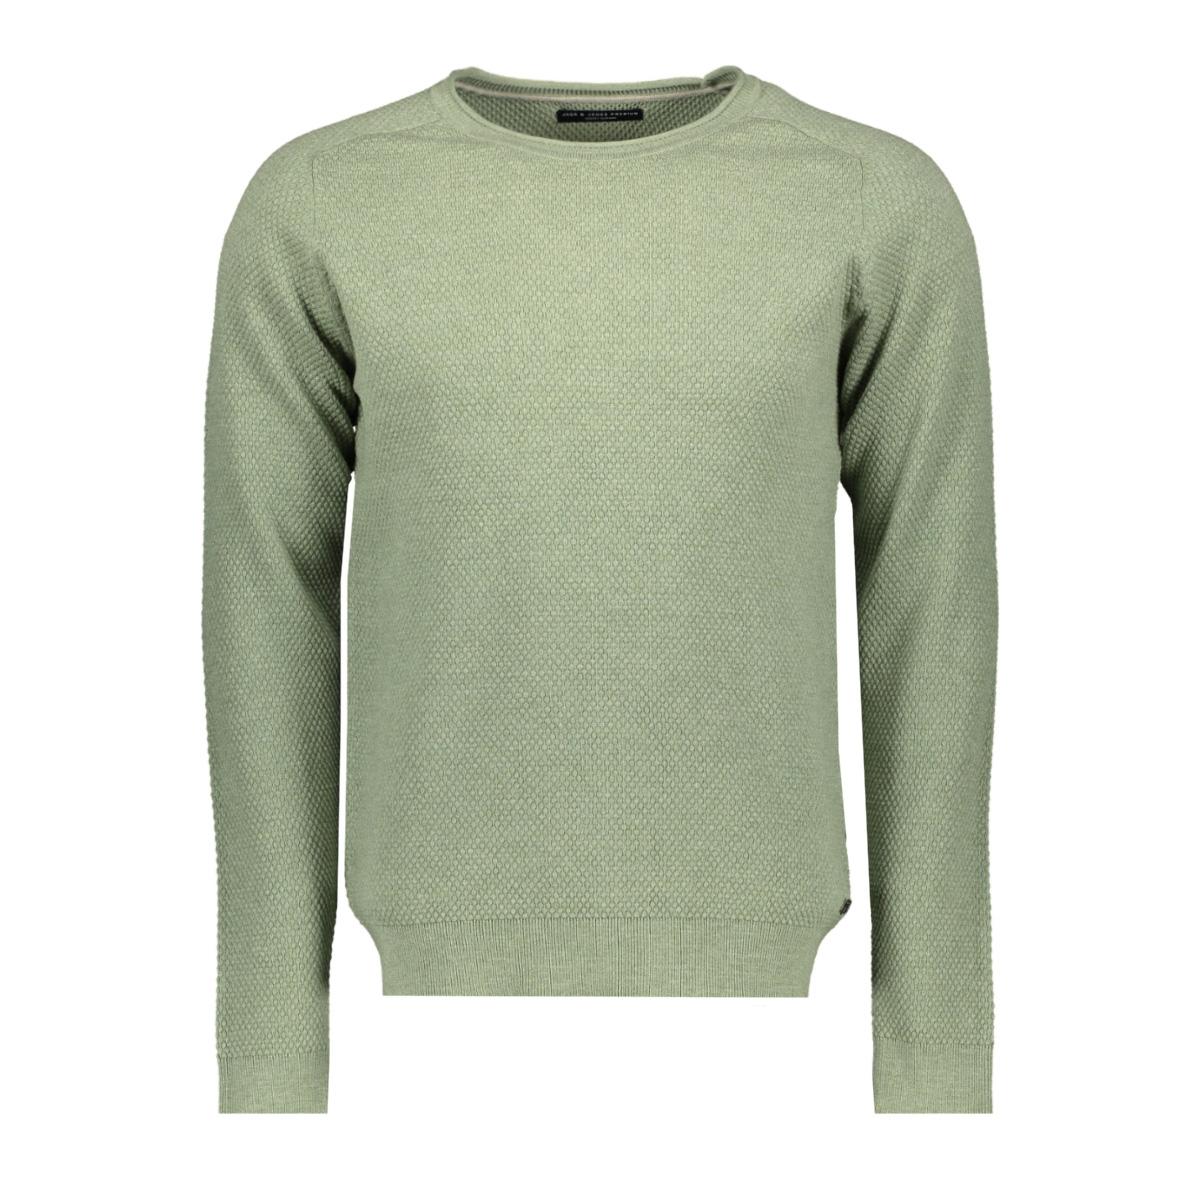 jprhardy knit crew neck 12146680 jack & jones trui duck green/ melange